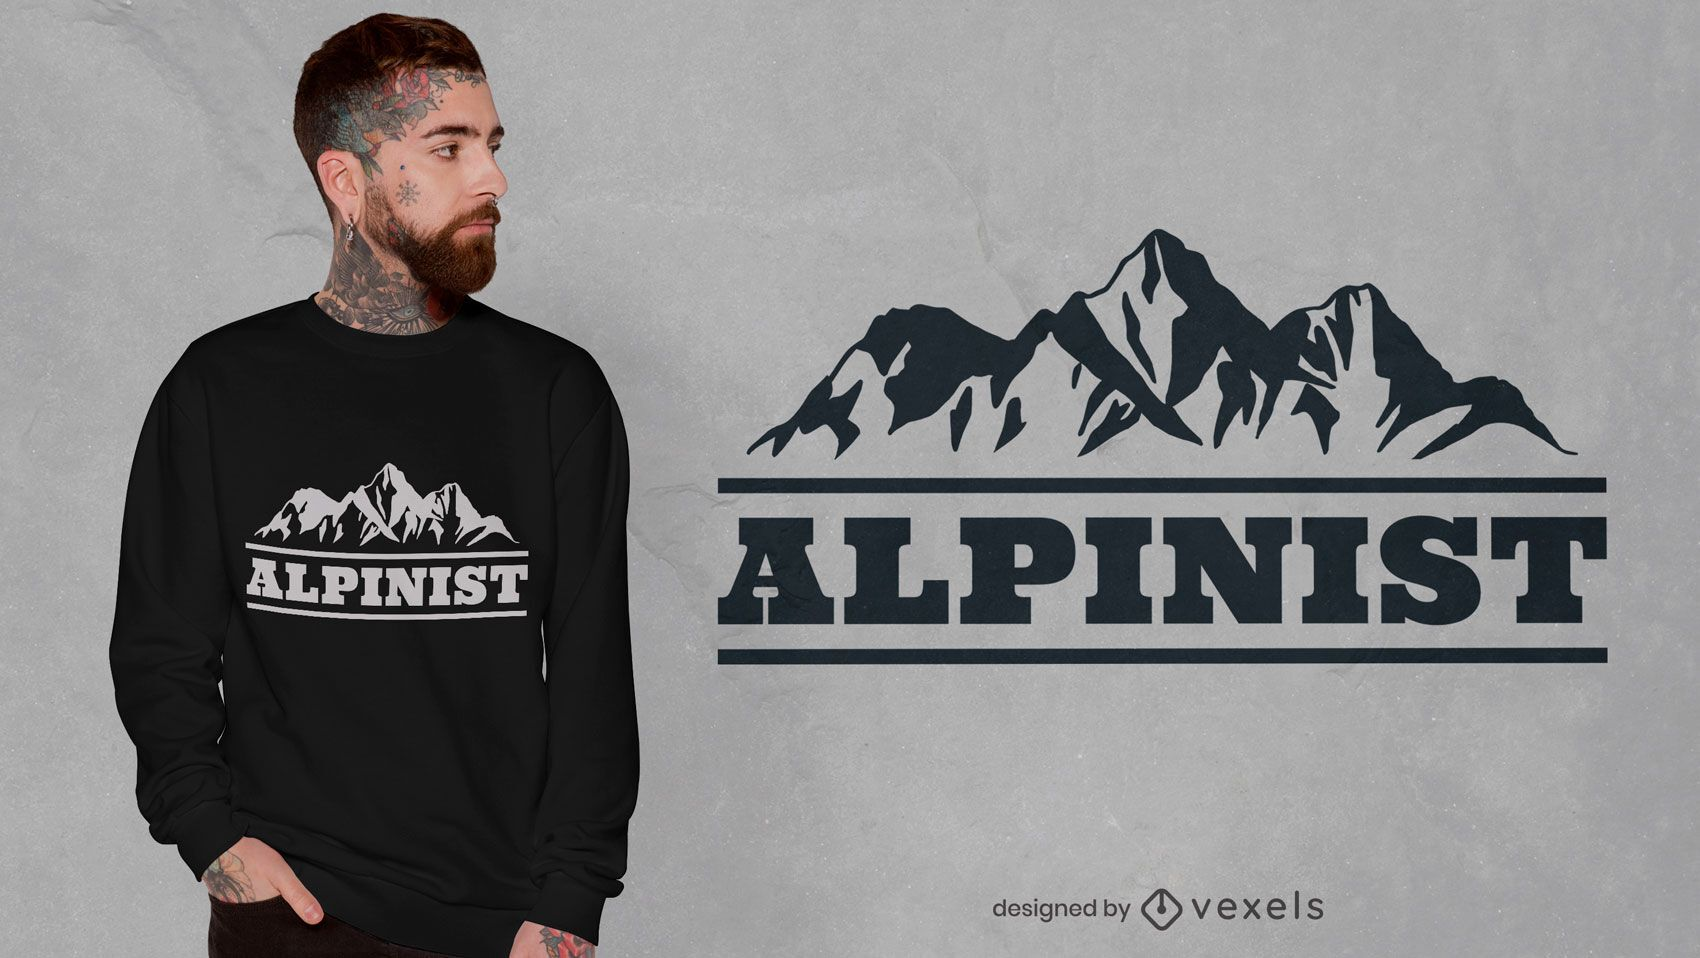 Mountain alpinist quote t-shirt design